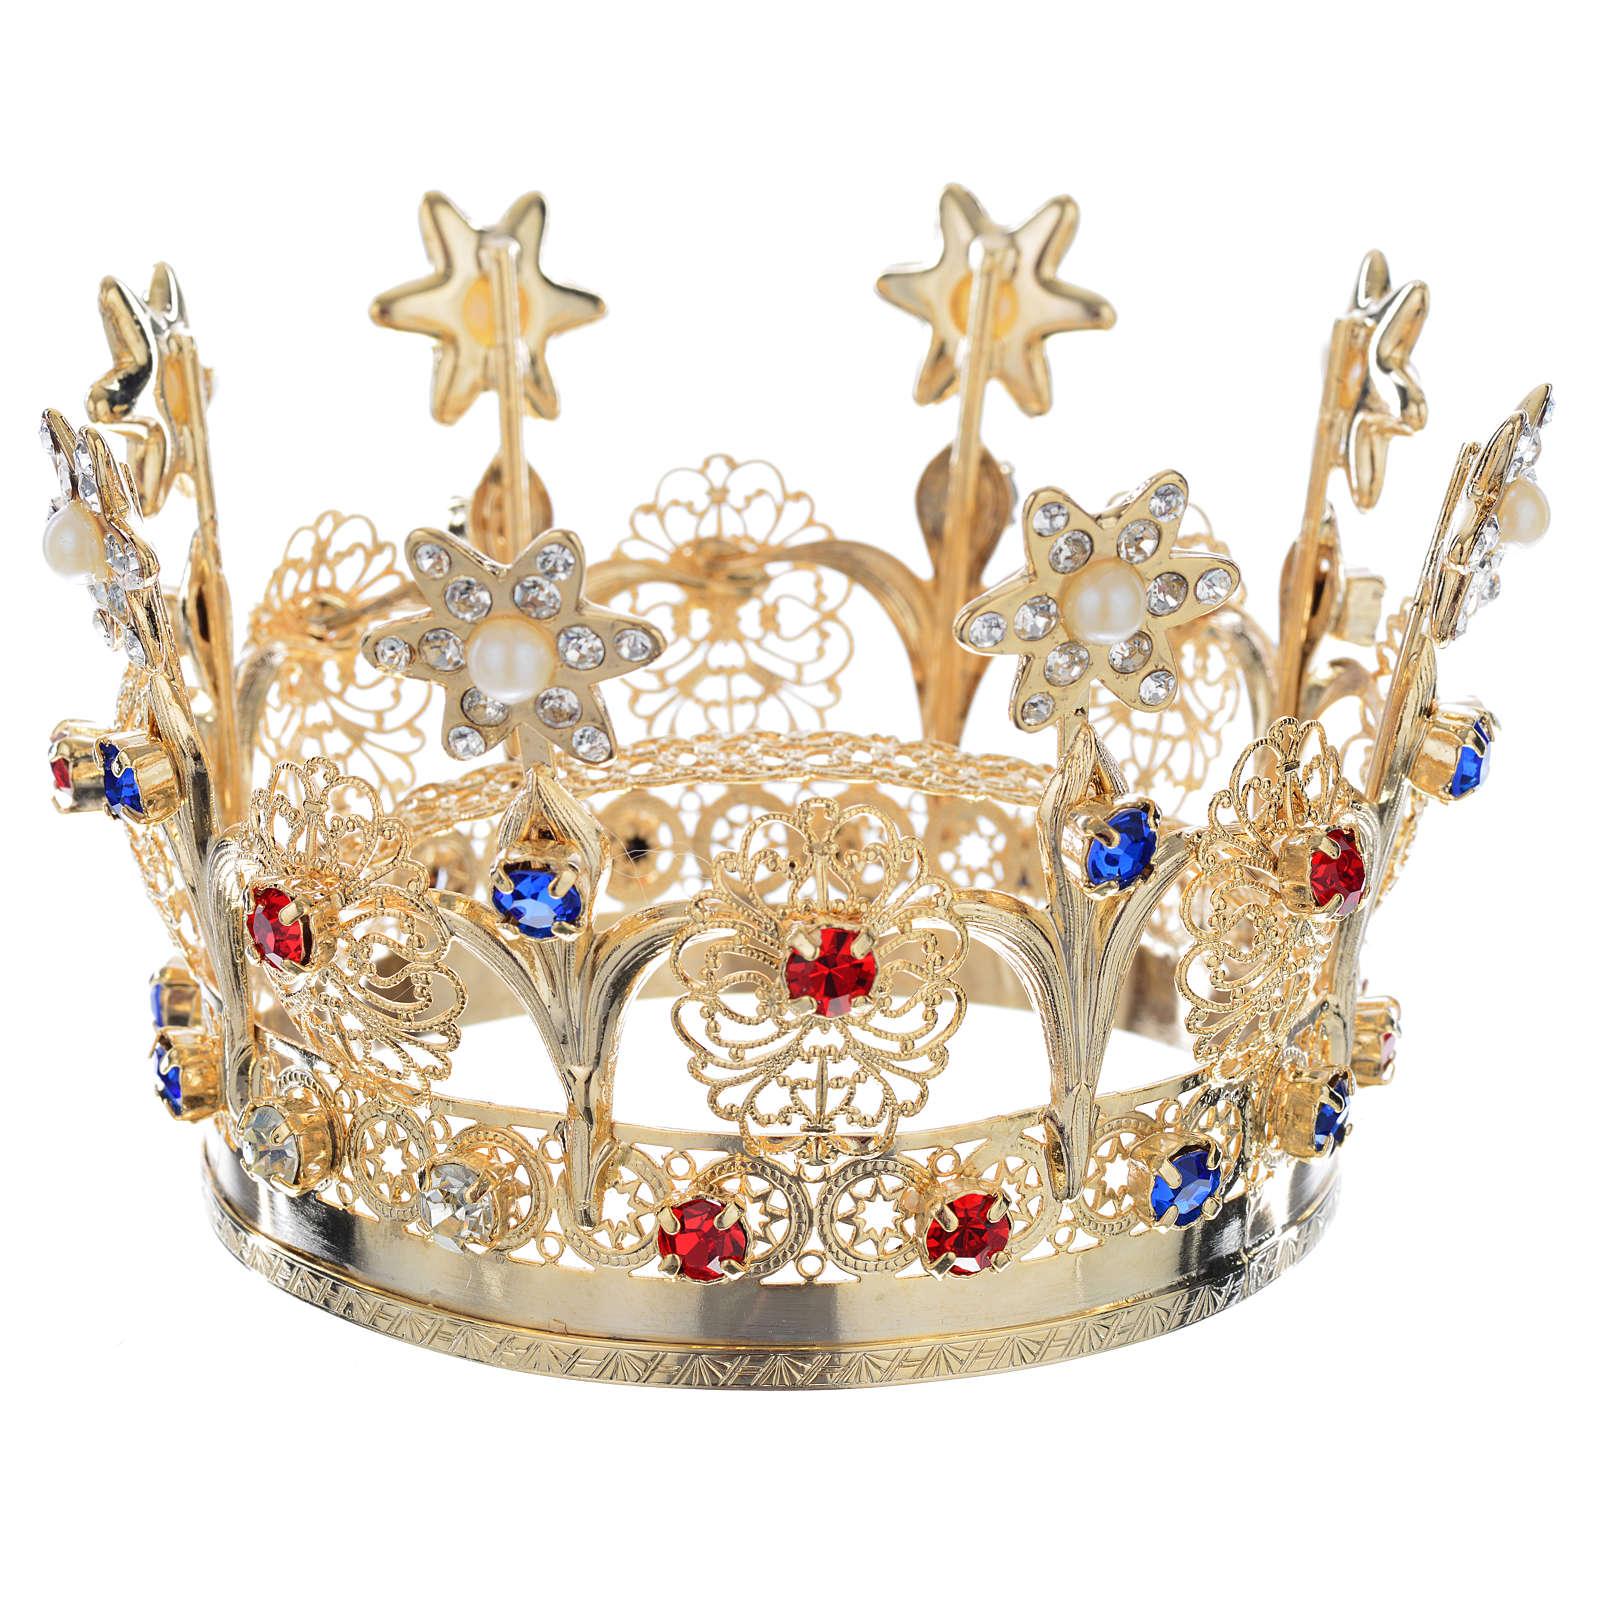 corona-reale-ottone-e-strass.jpg